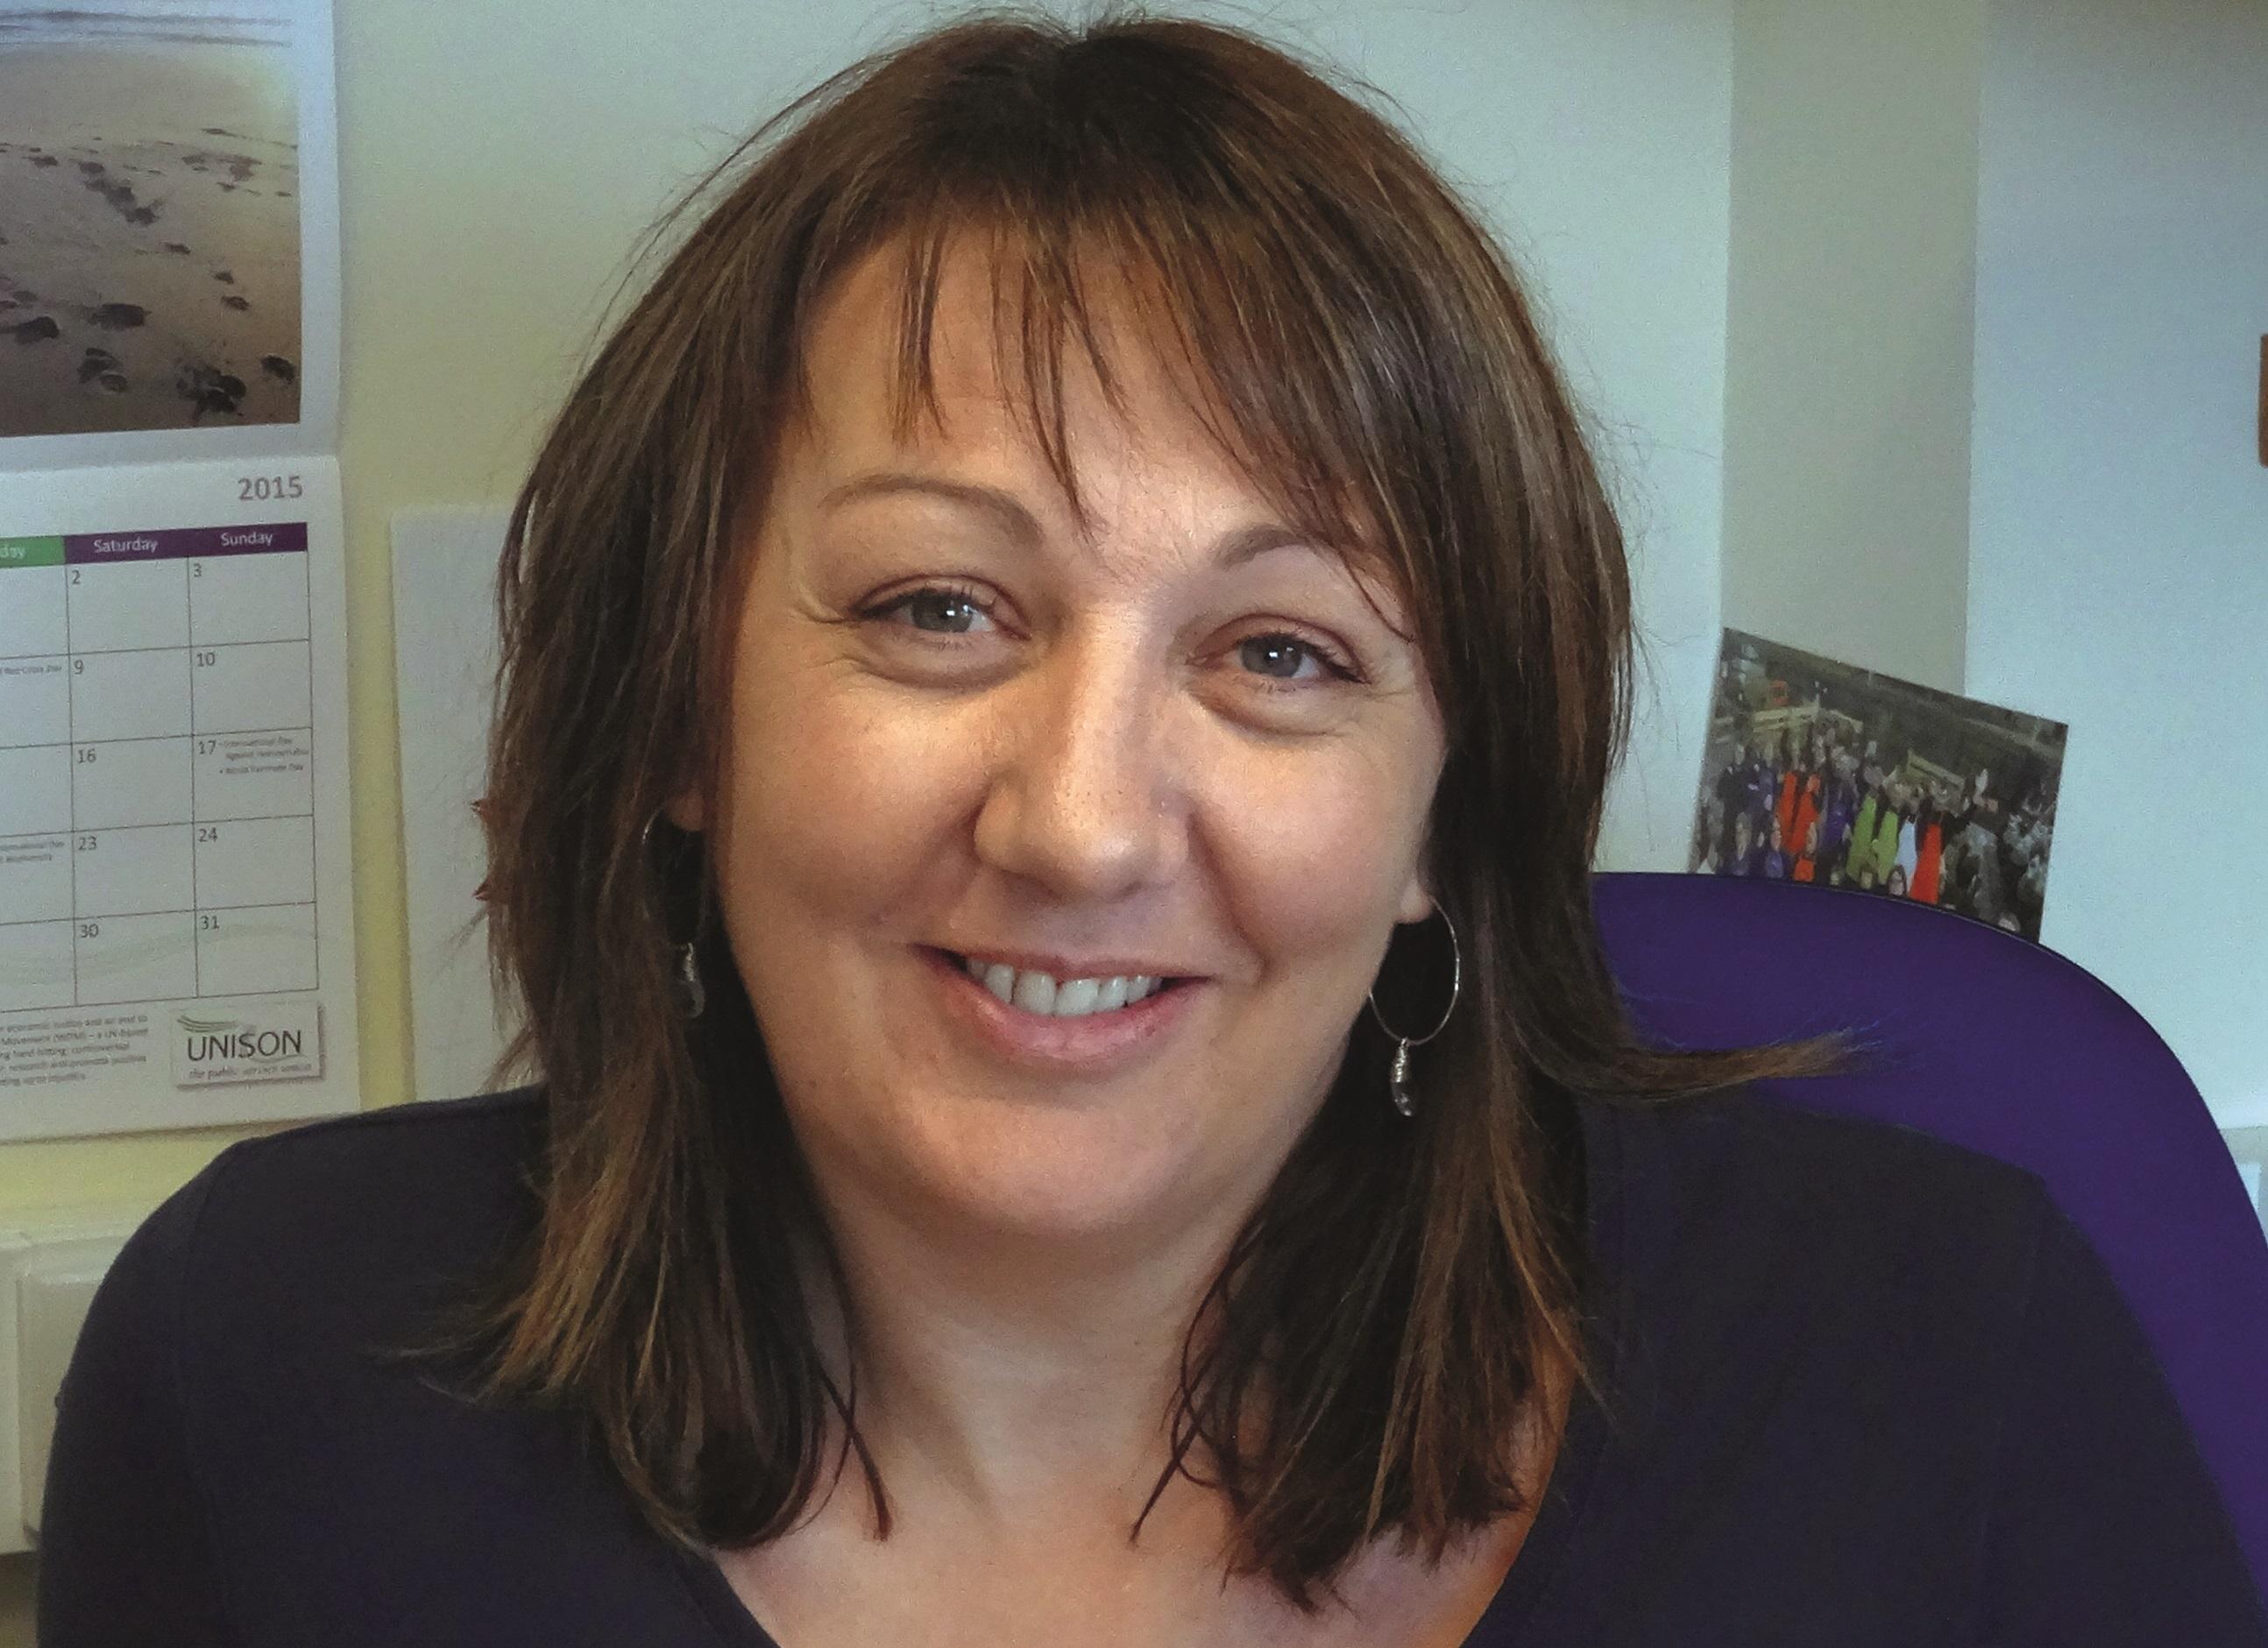 19. Ingrid Webb – Chief executive, Cope Ltd